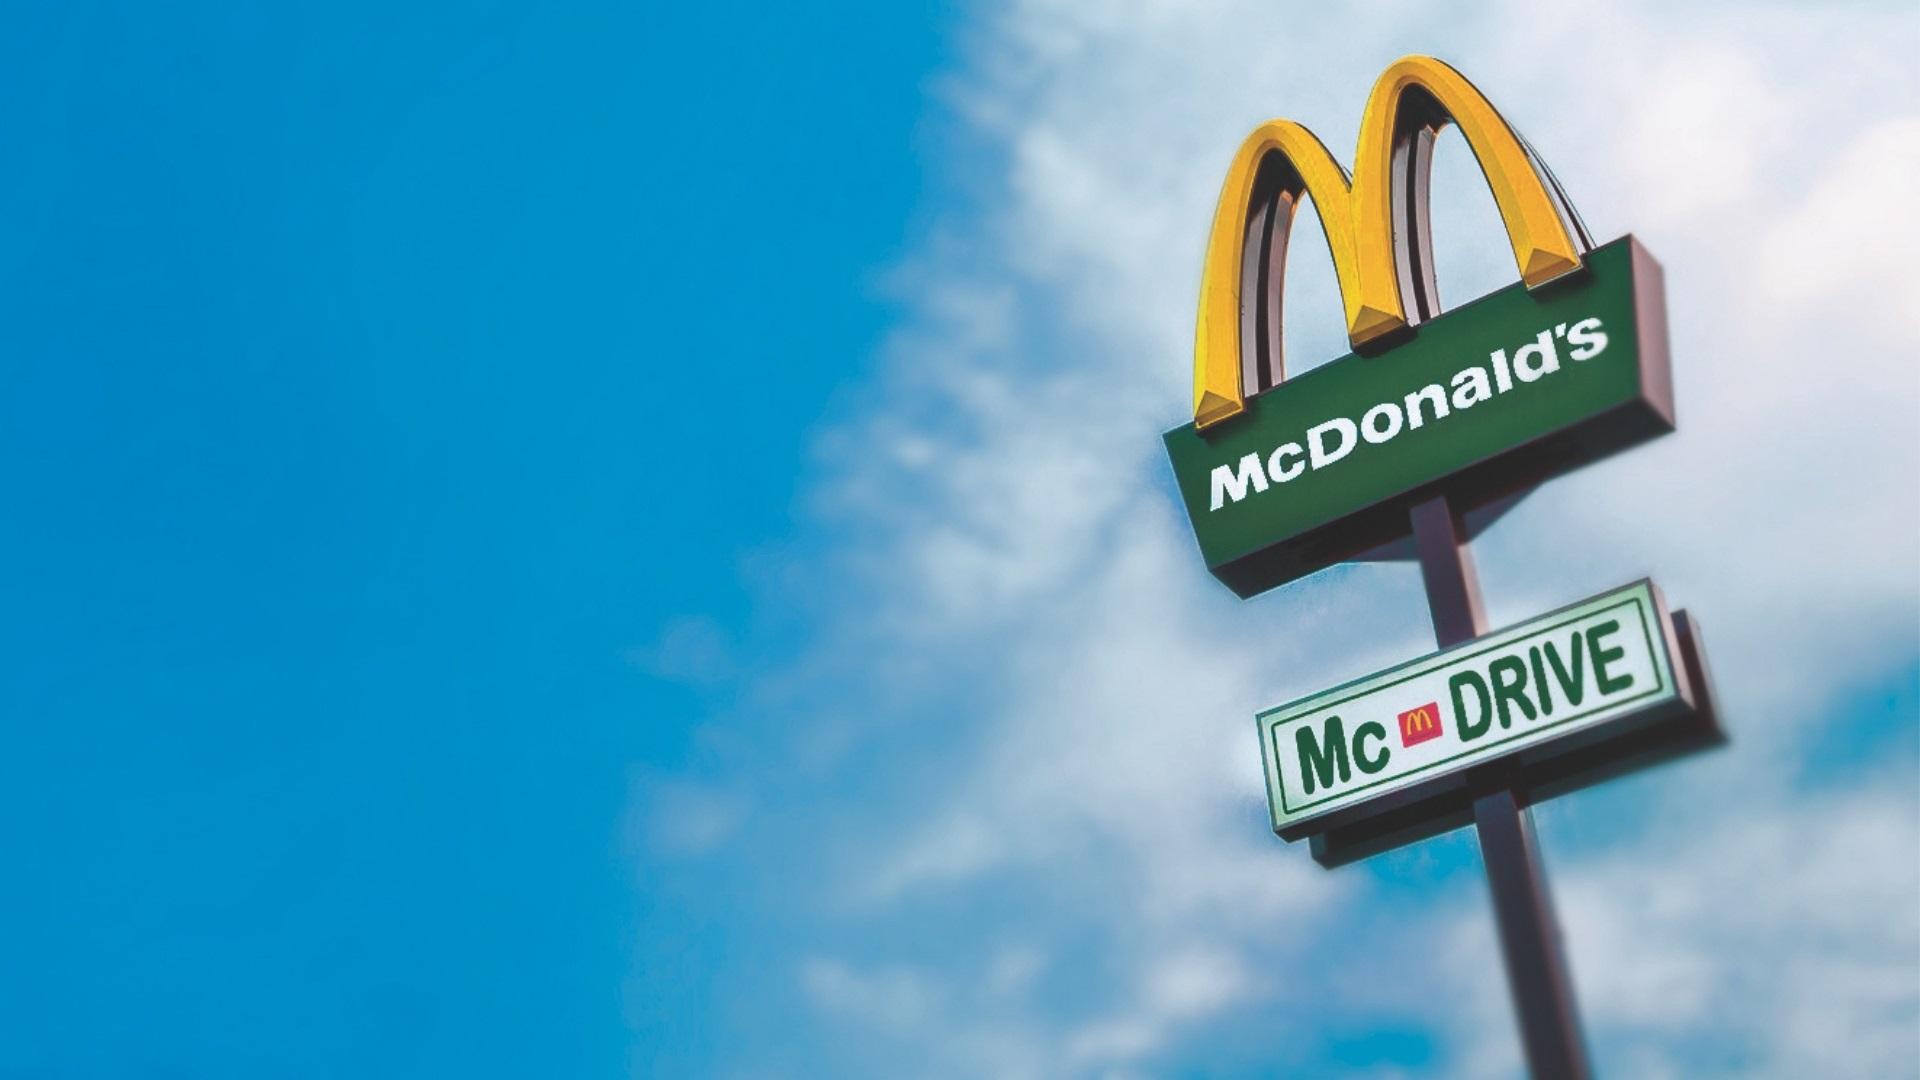 mcdonalds preuređenje